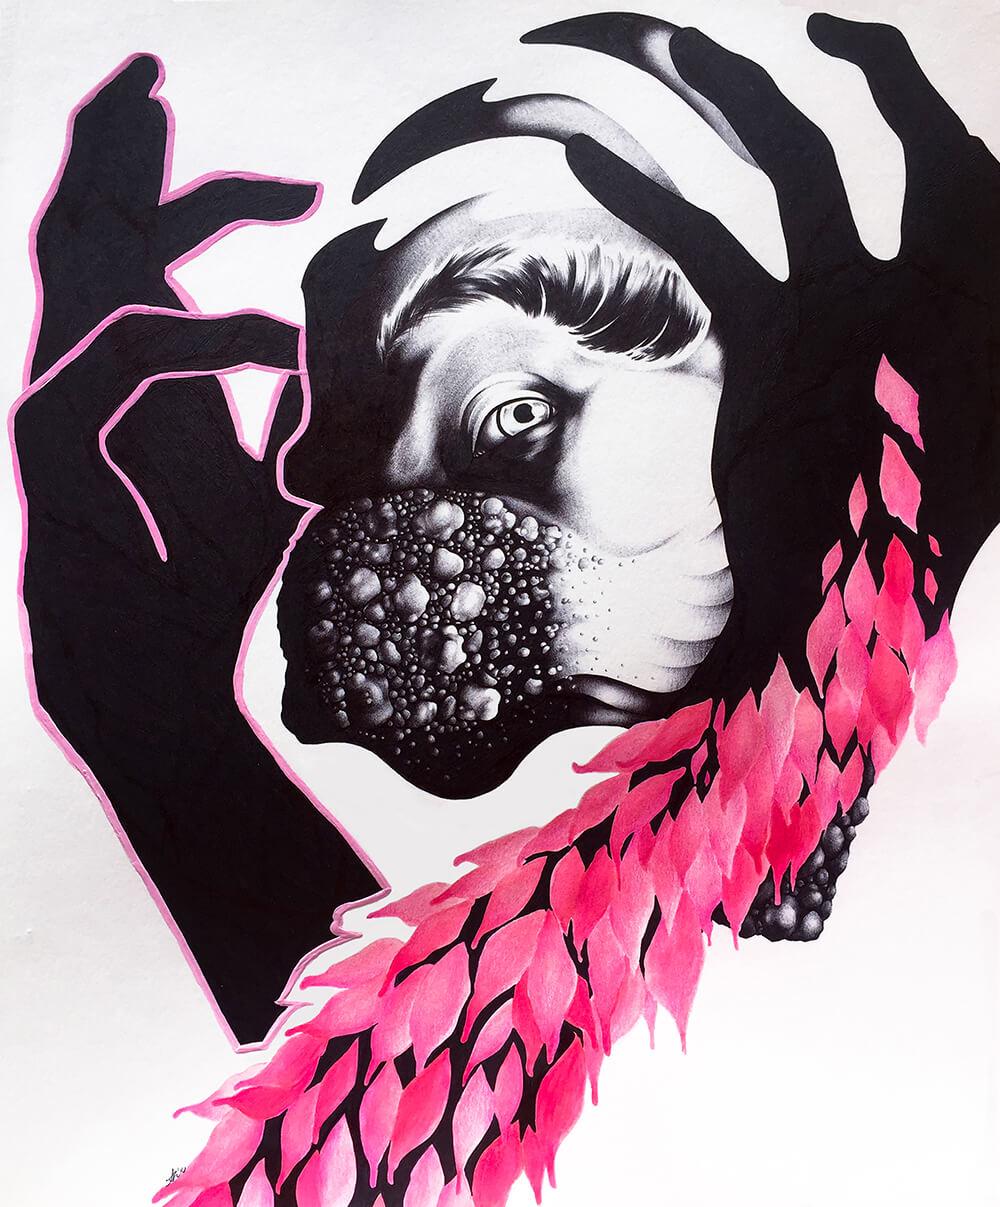 Creature #2 Medium: Black Ballpoint Pen, Watercolor, Colored Pencil, and Gouache